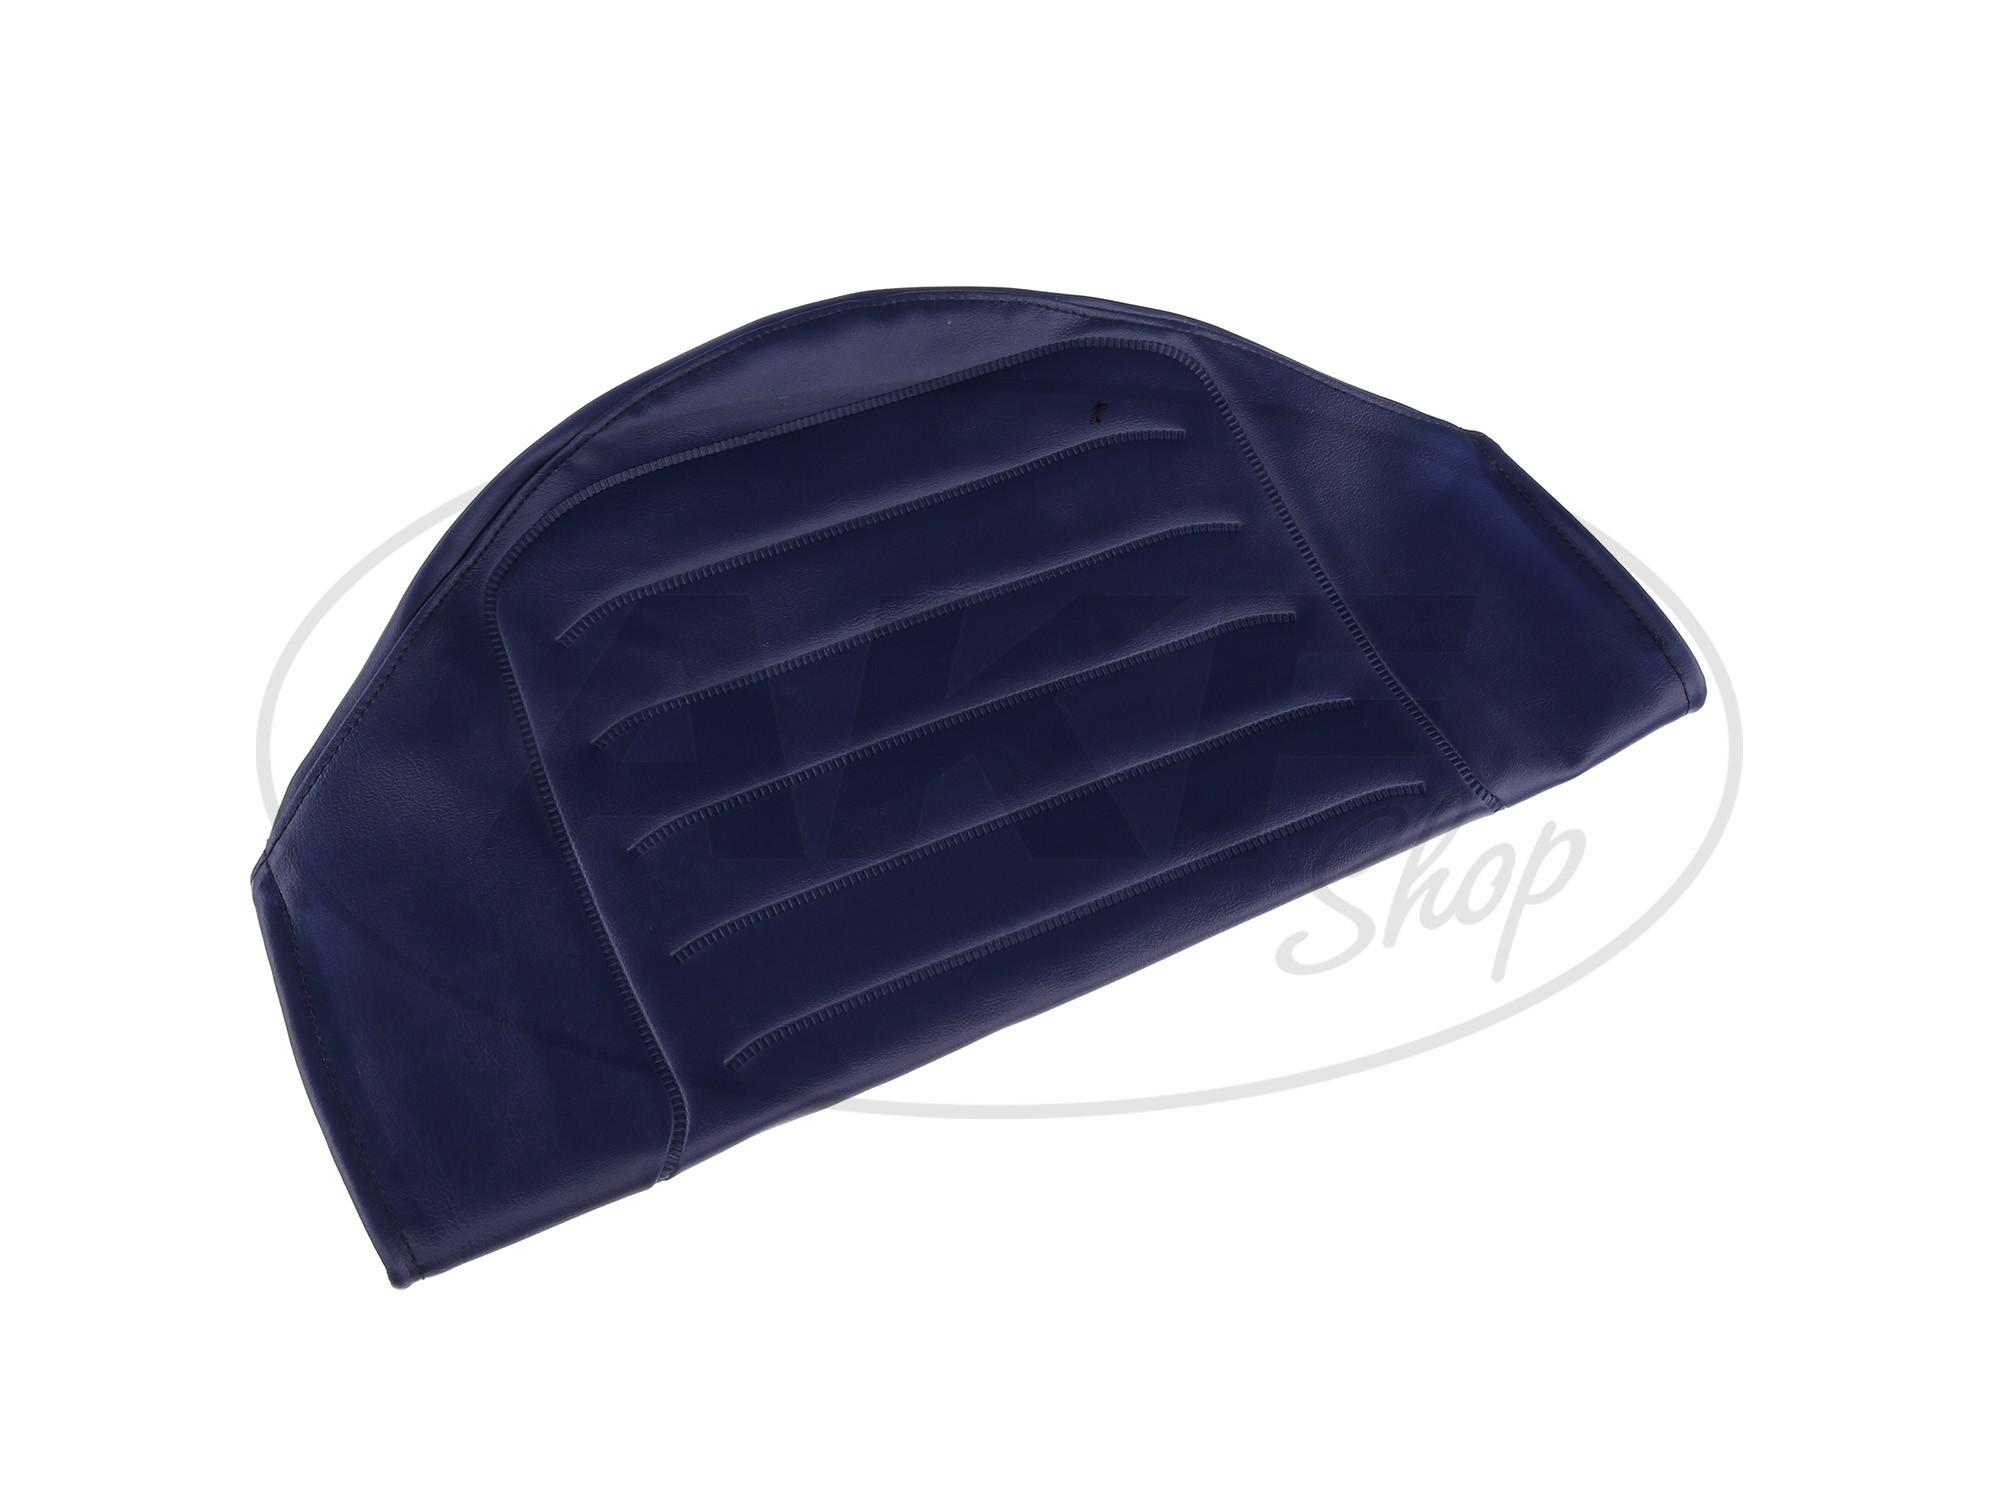 sitzbezug strukturiert blau ohne schriftzug simson s53 s83 sr50 sr80. Black Bedroom Furniture Sets. Home Design Ideas